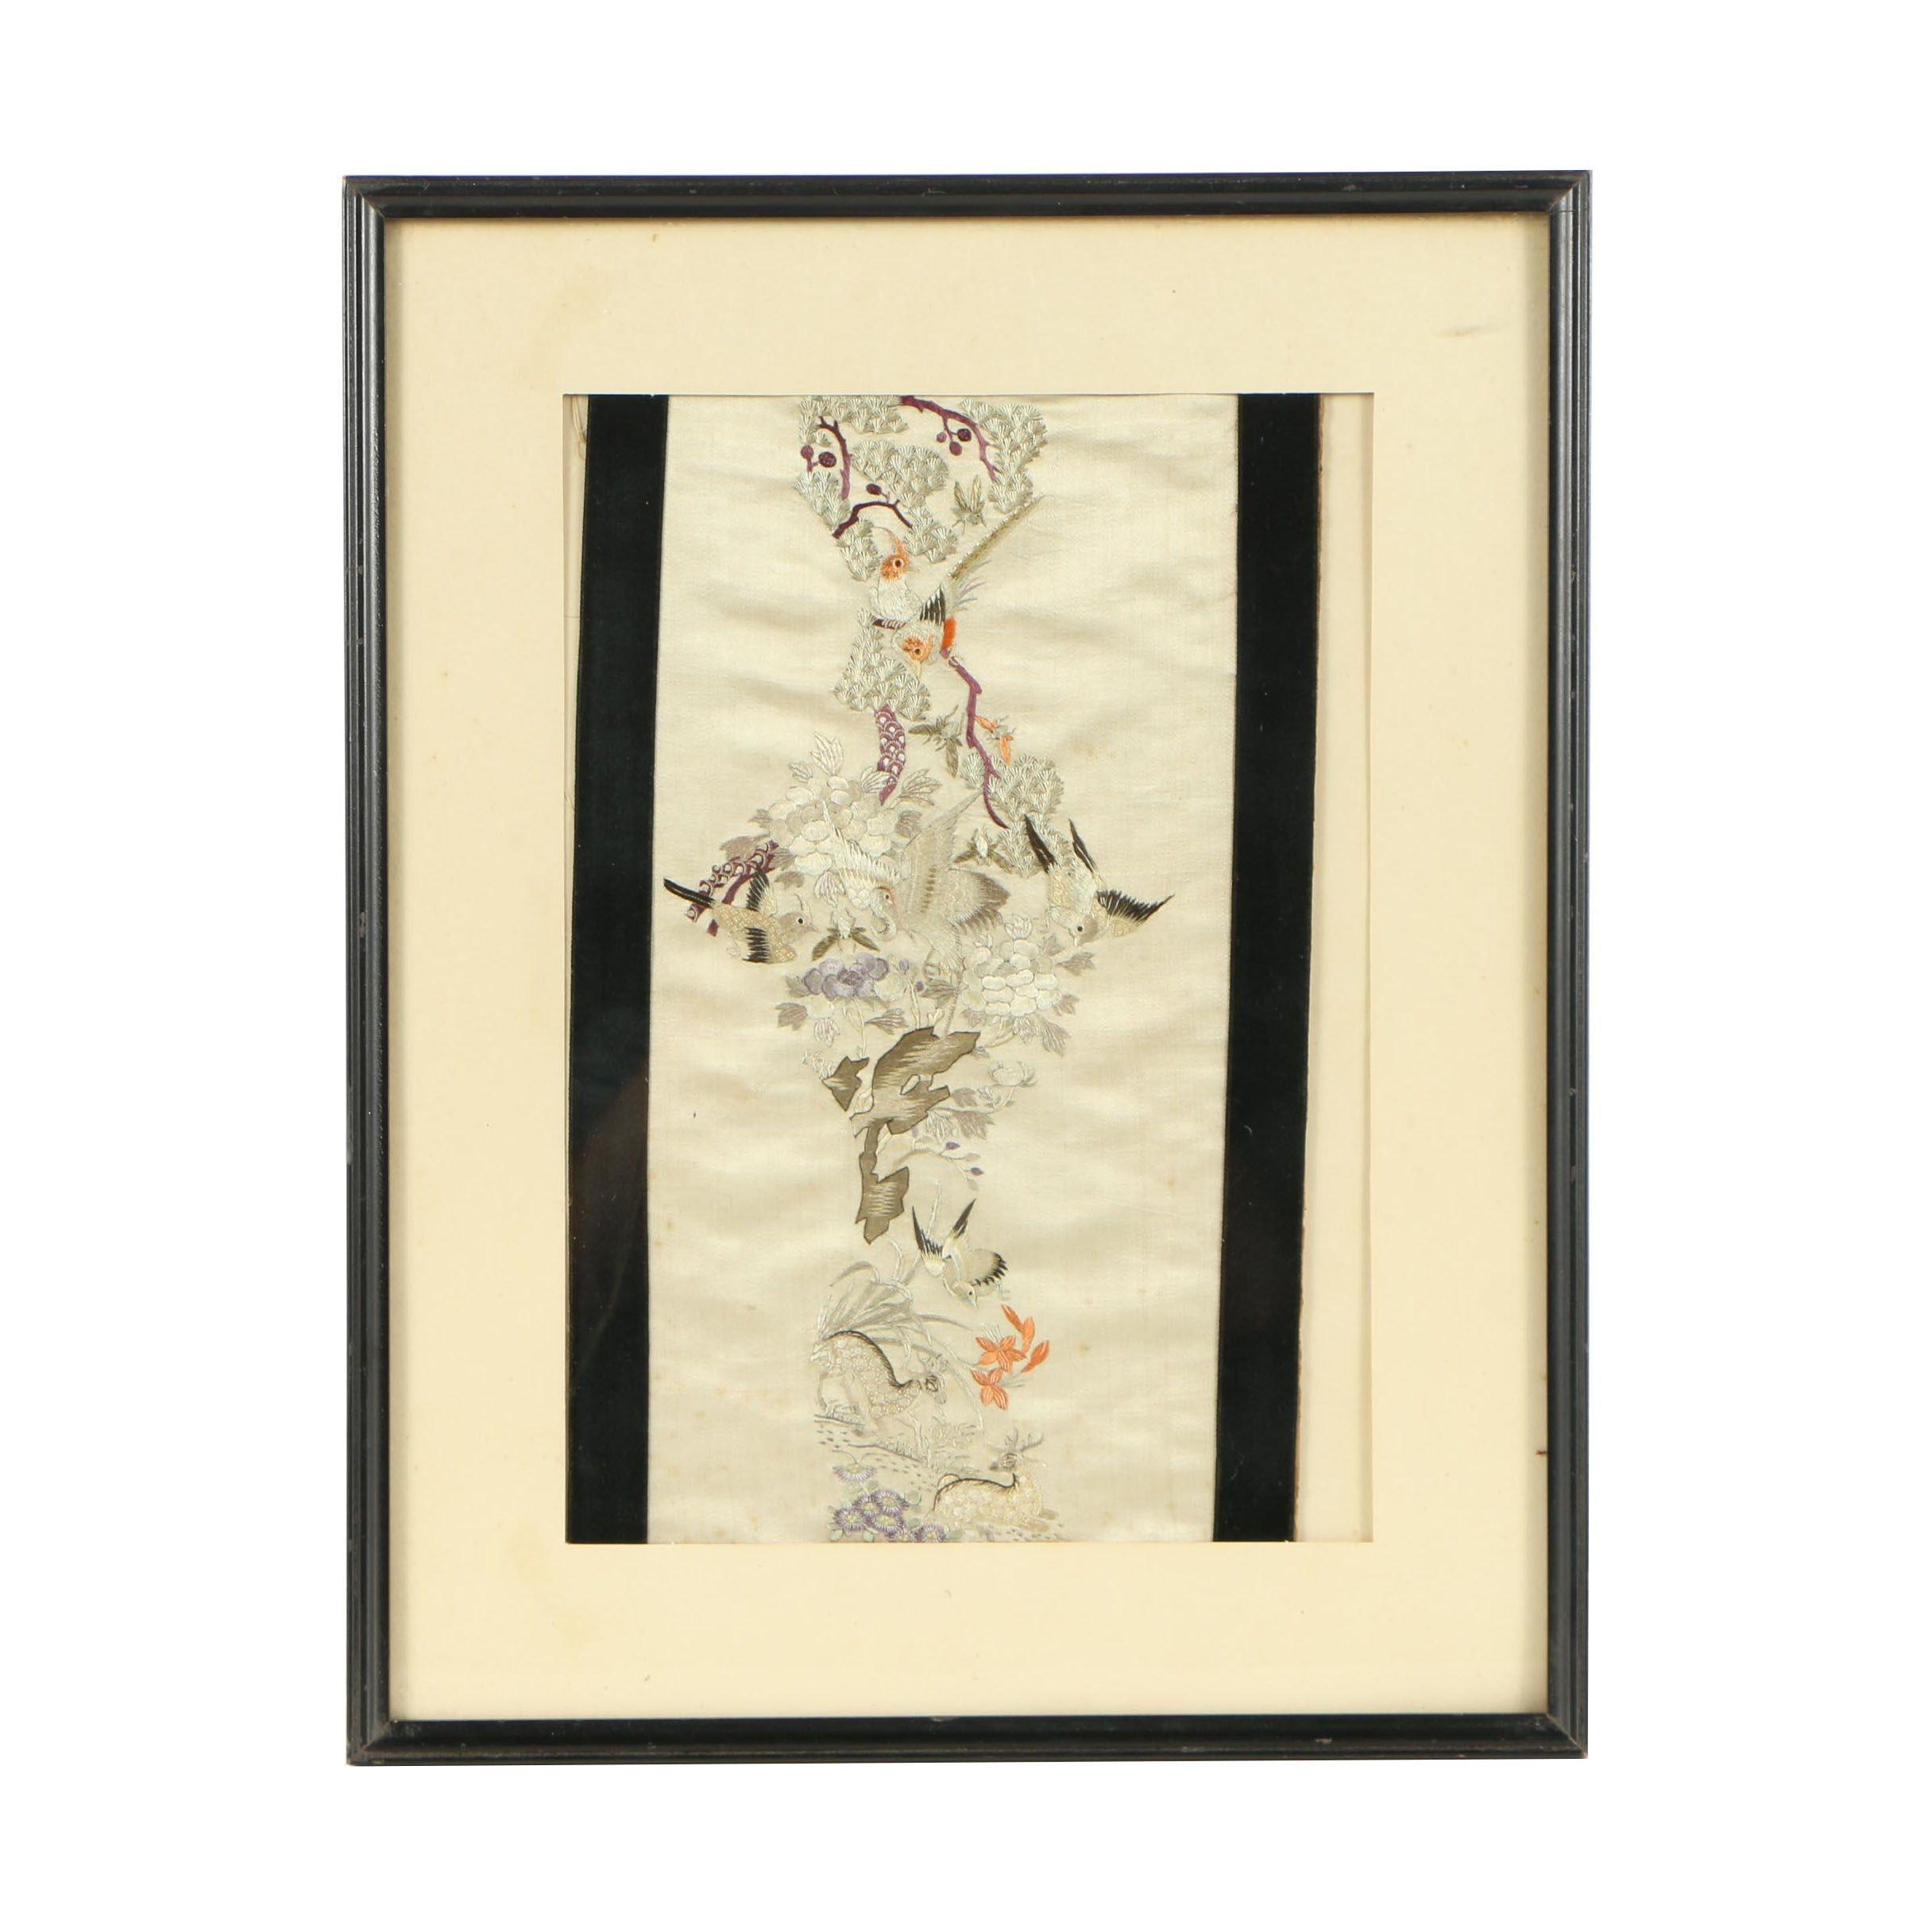 Framed Japanese Silk Embroidered Panel Ebth